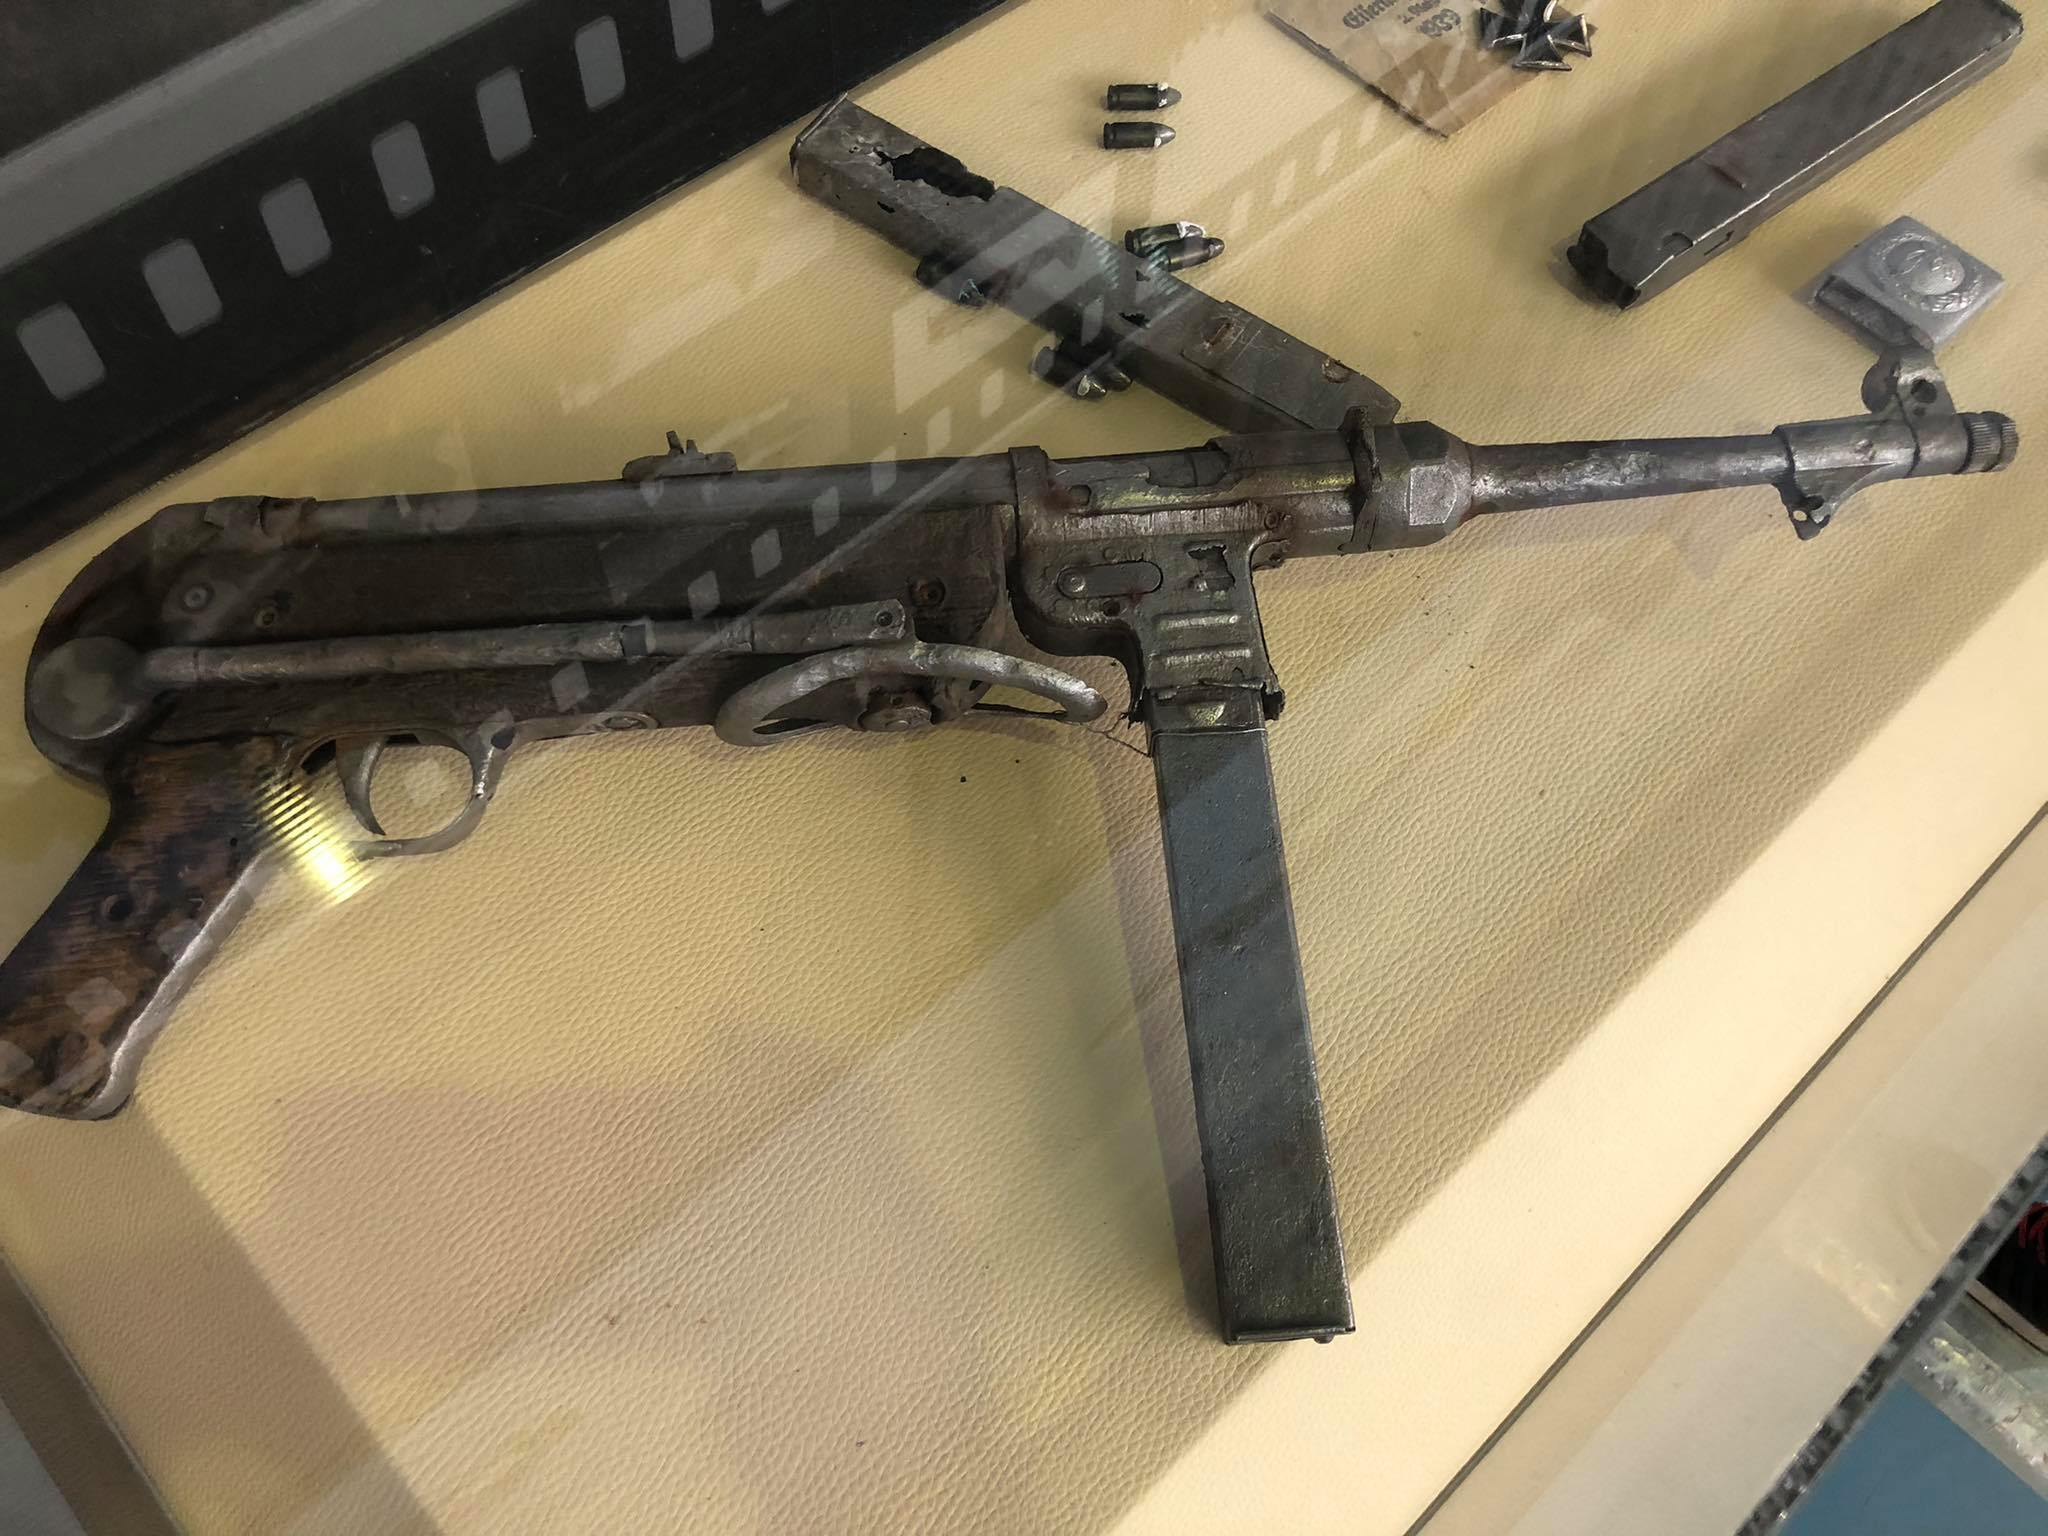 An MP40 found inside the Ju52